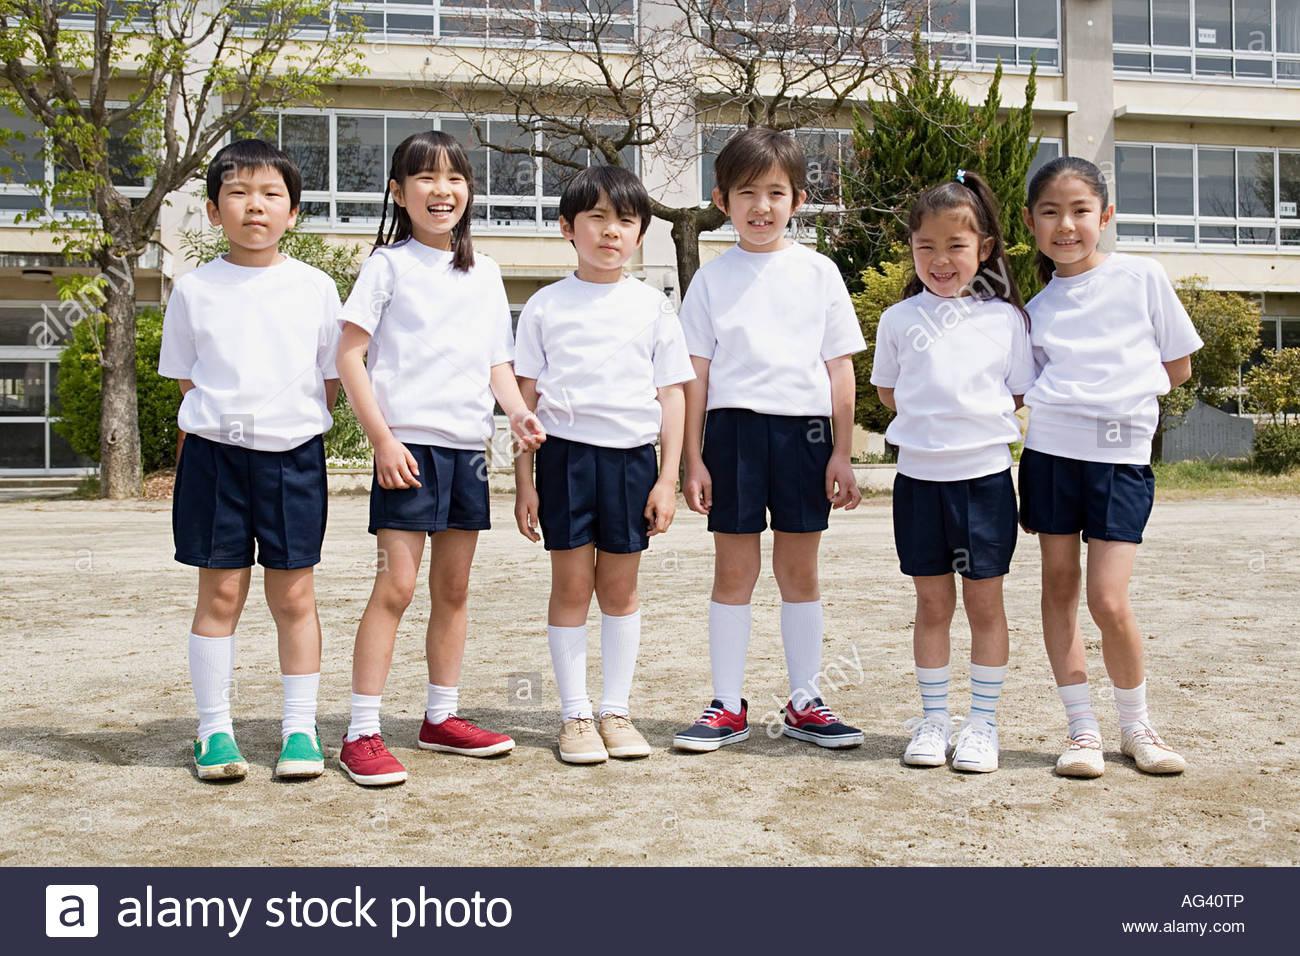 A portrait of a school children - Stock Image